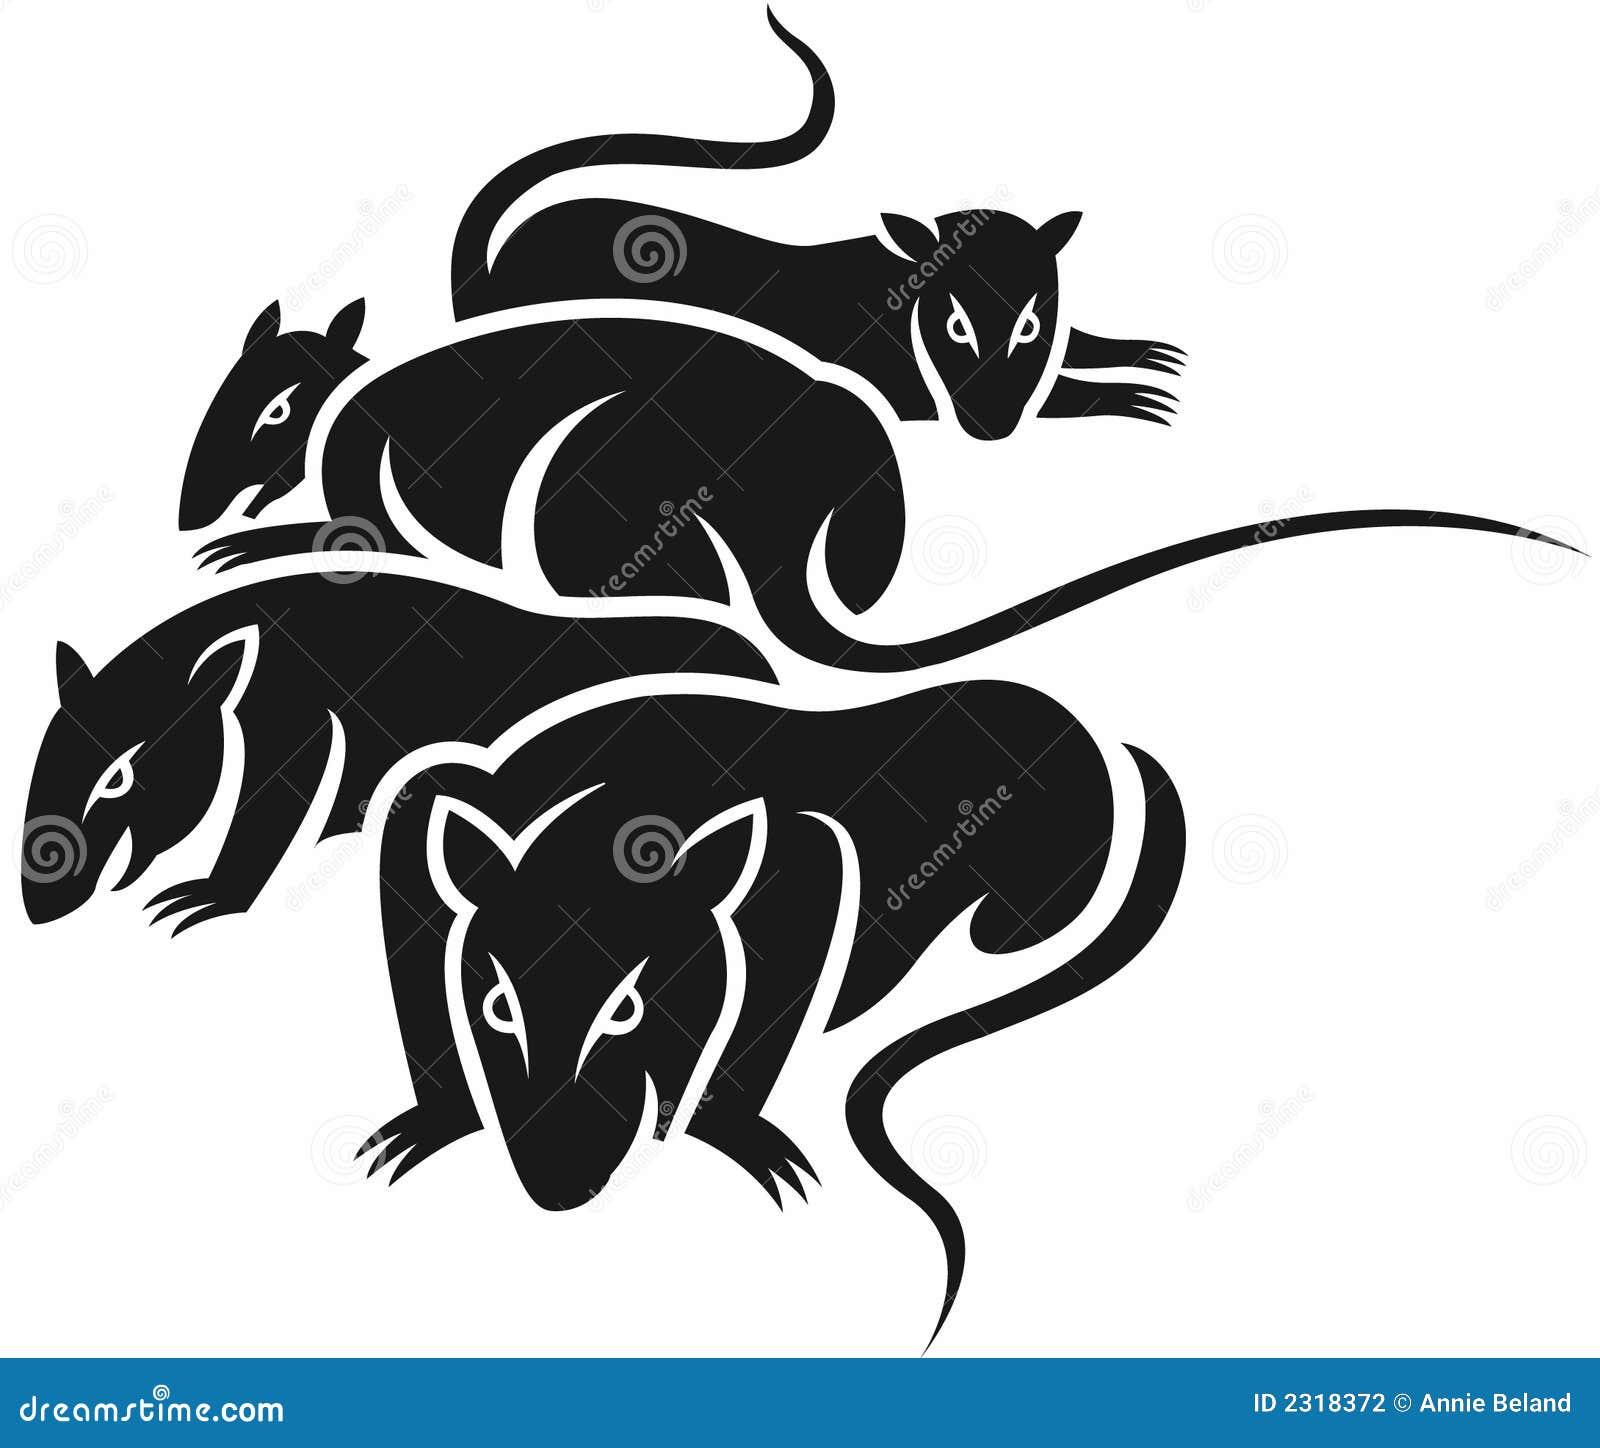 Group of bad rats